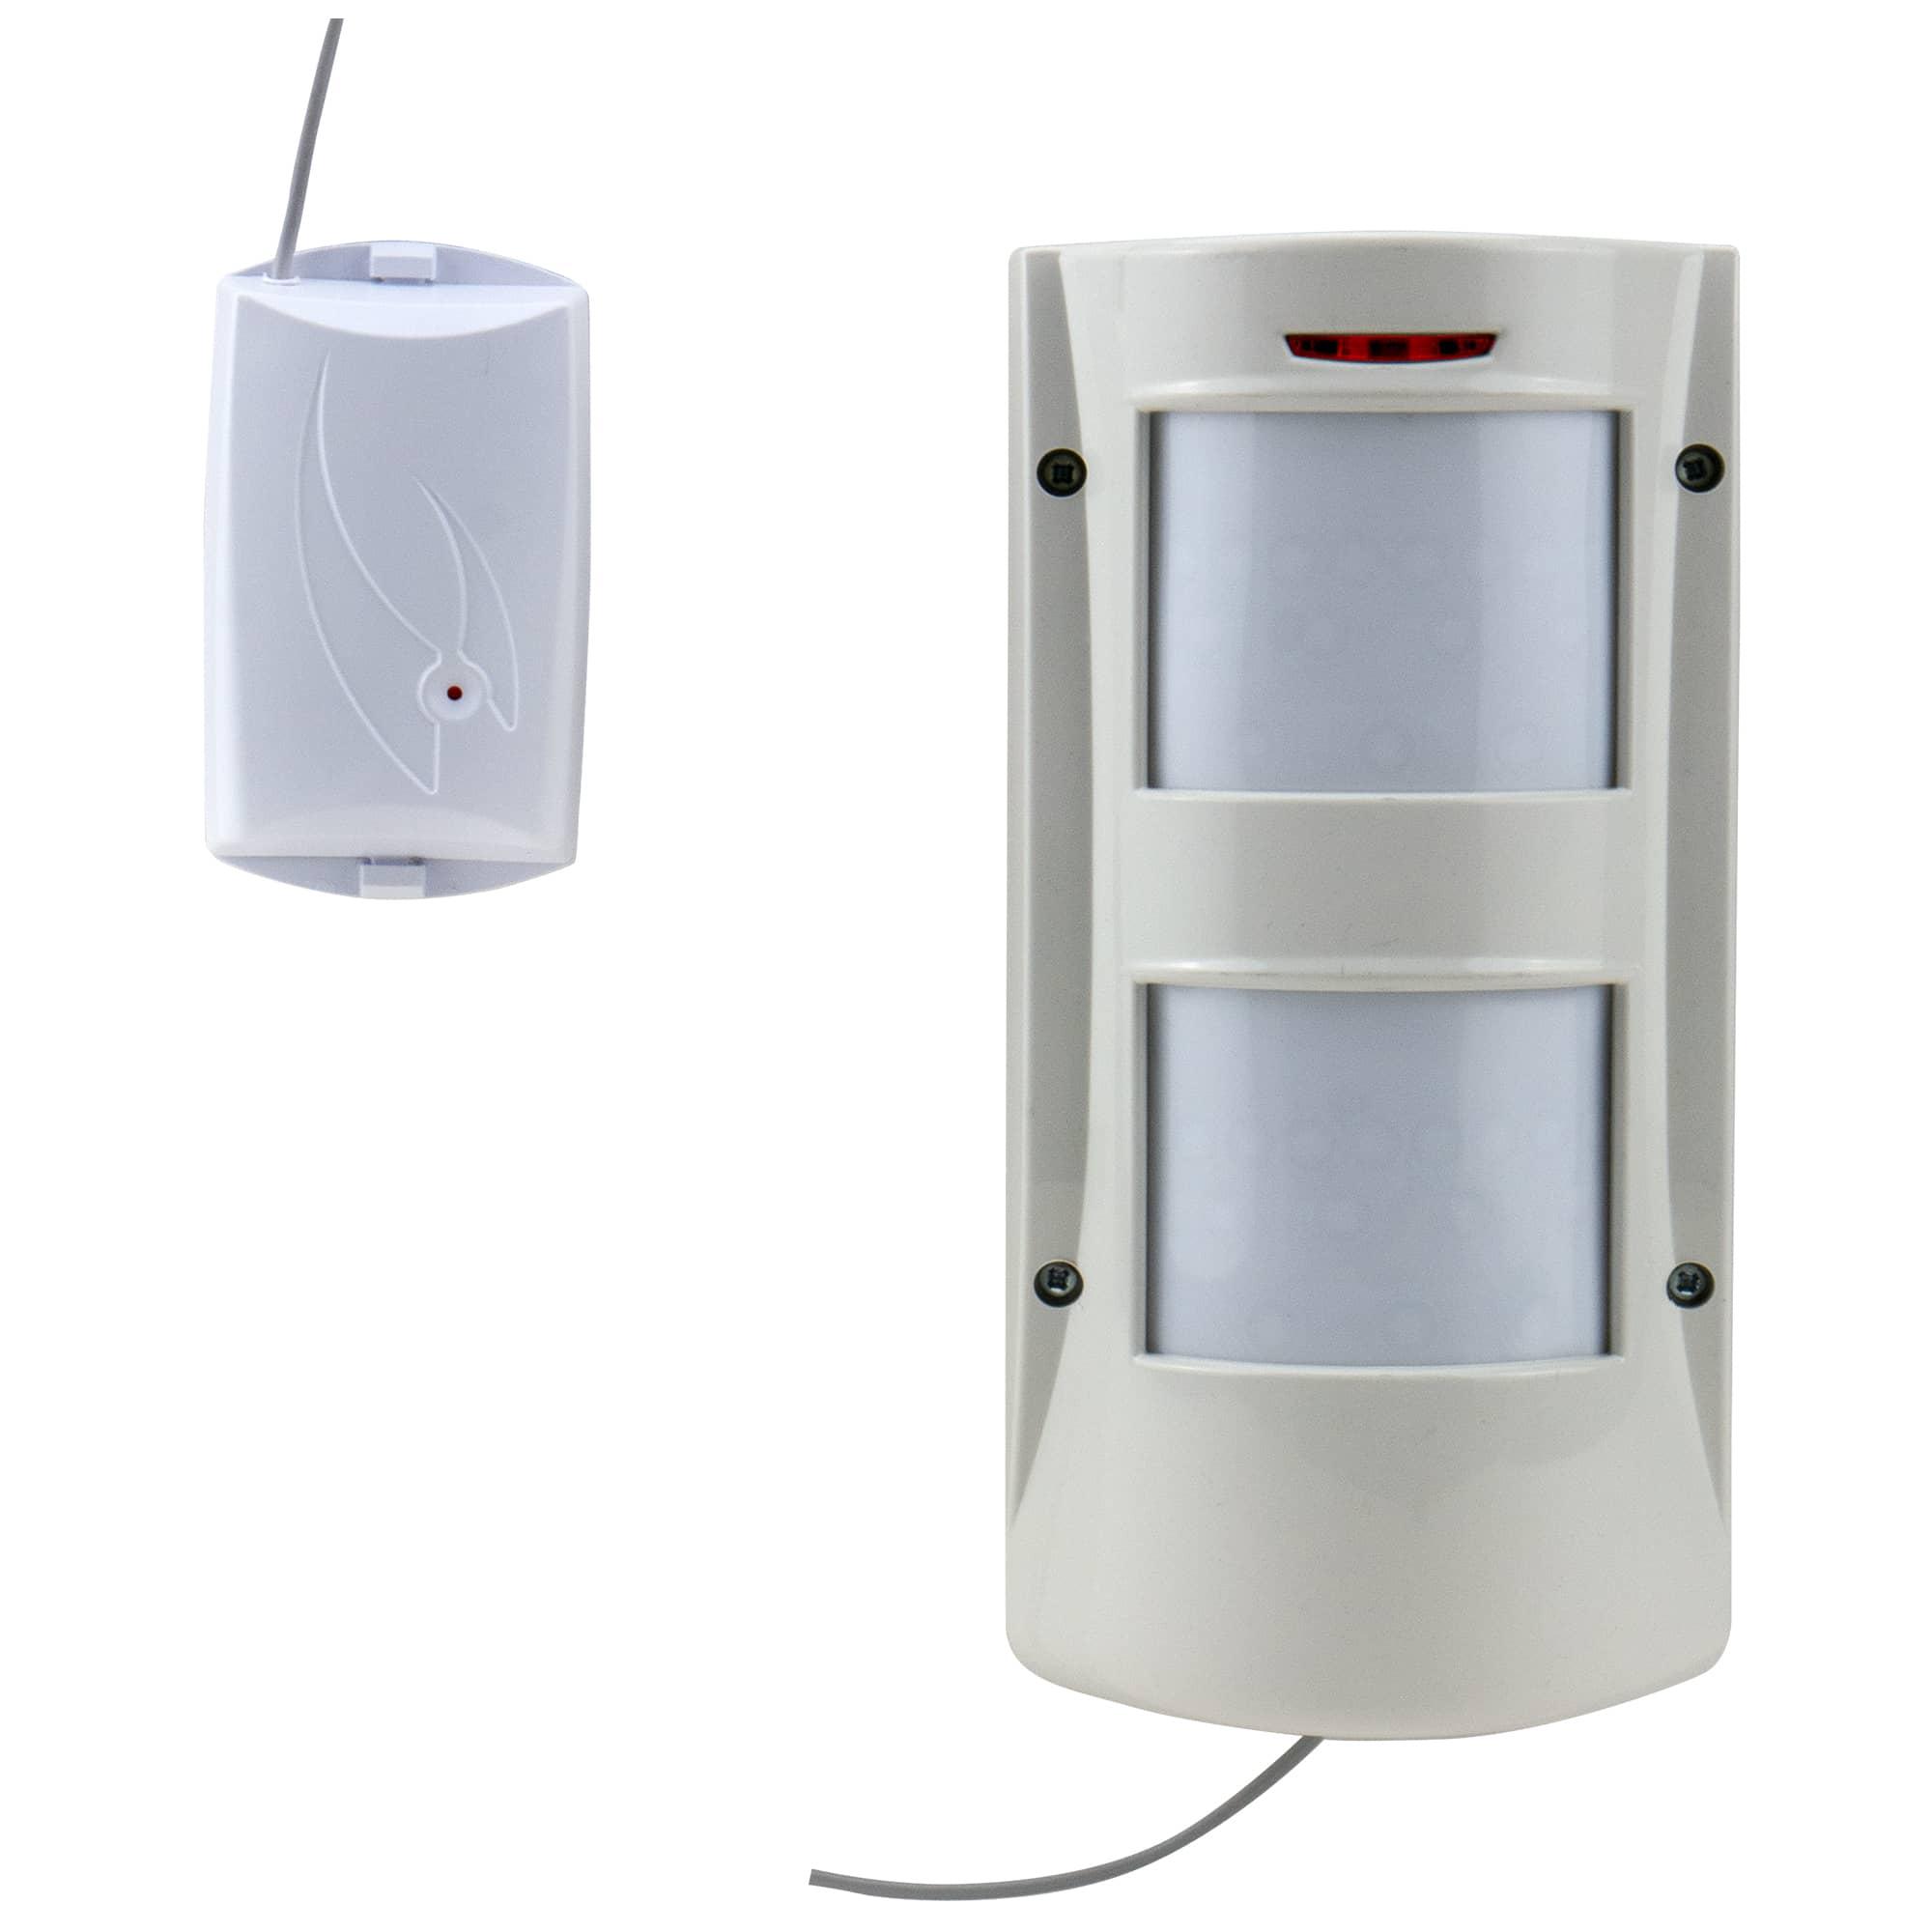 Sensor Duowill Gonner Alarmas